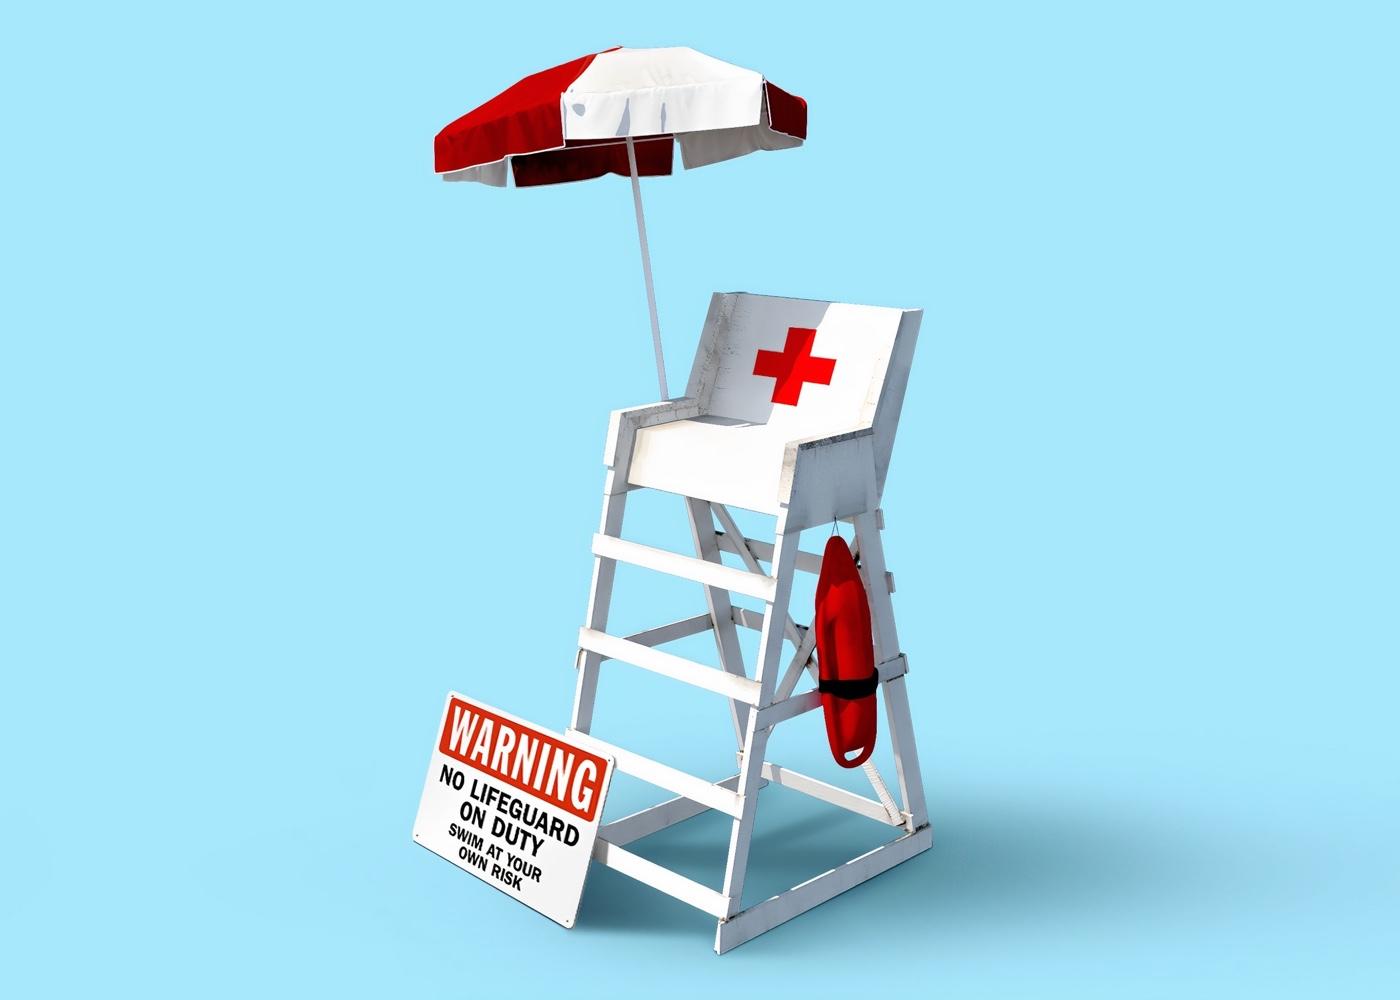 Lifeguard Hochsitz